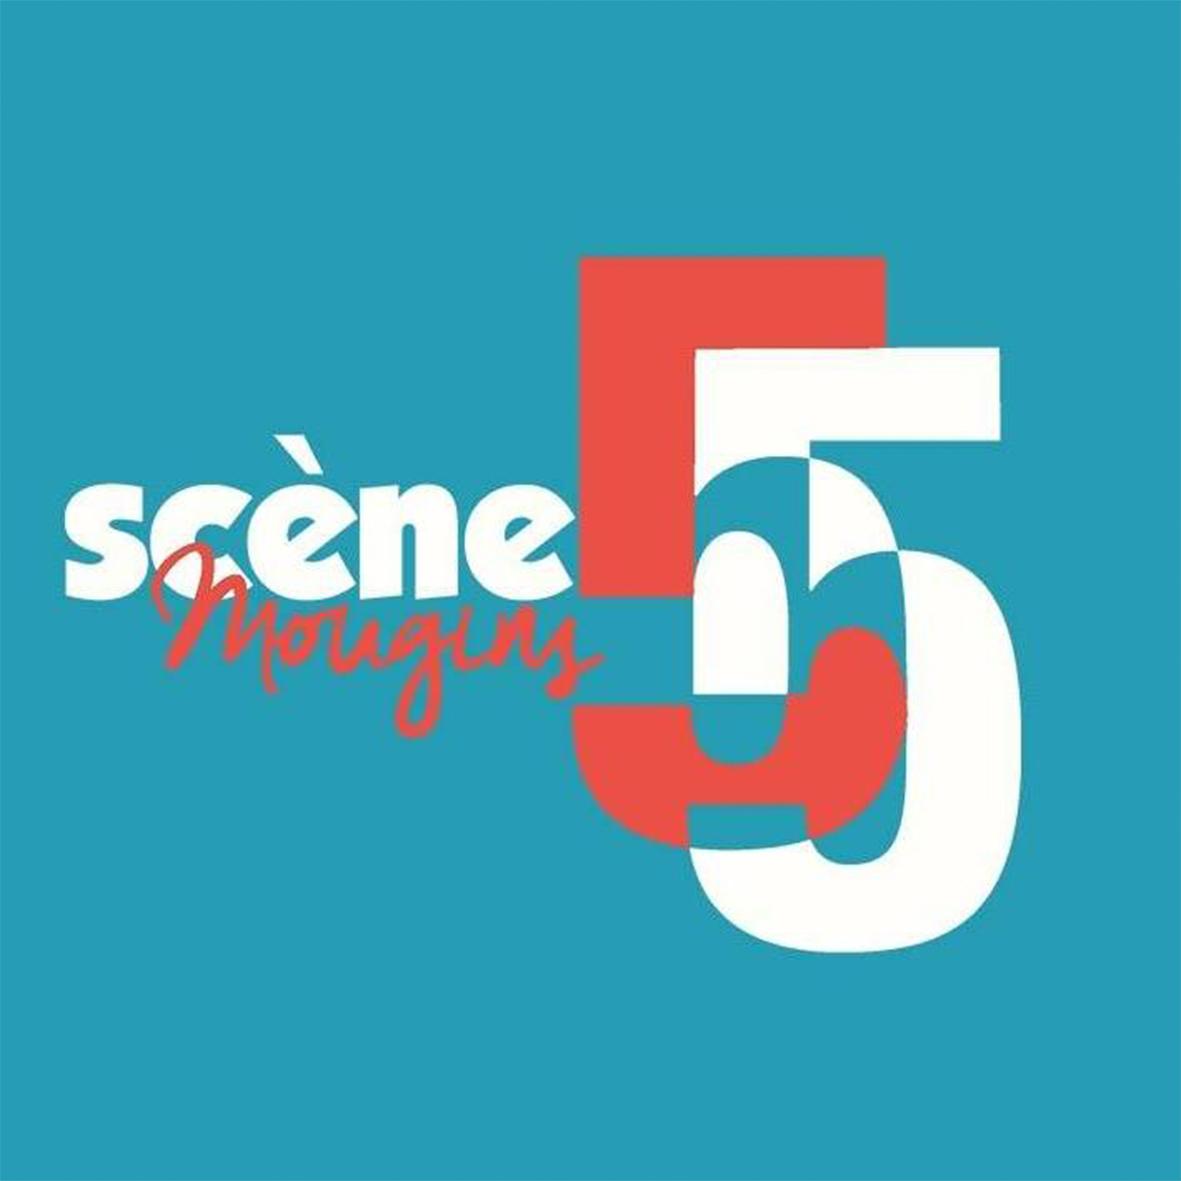 Scène 55